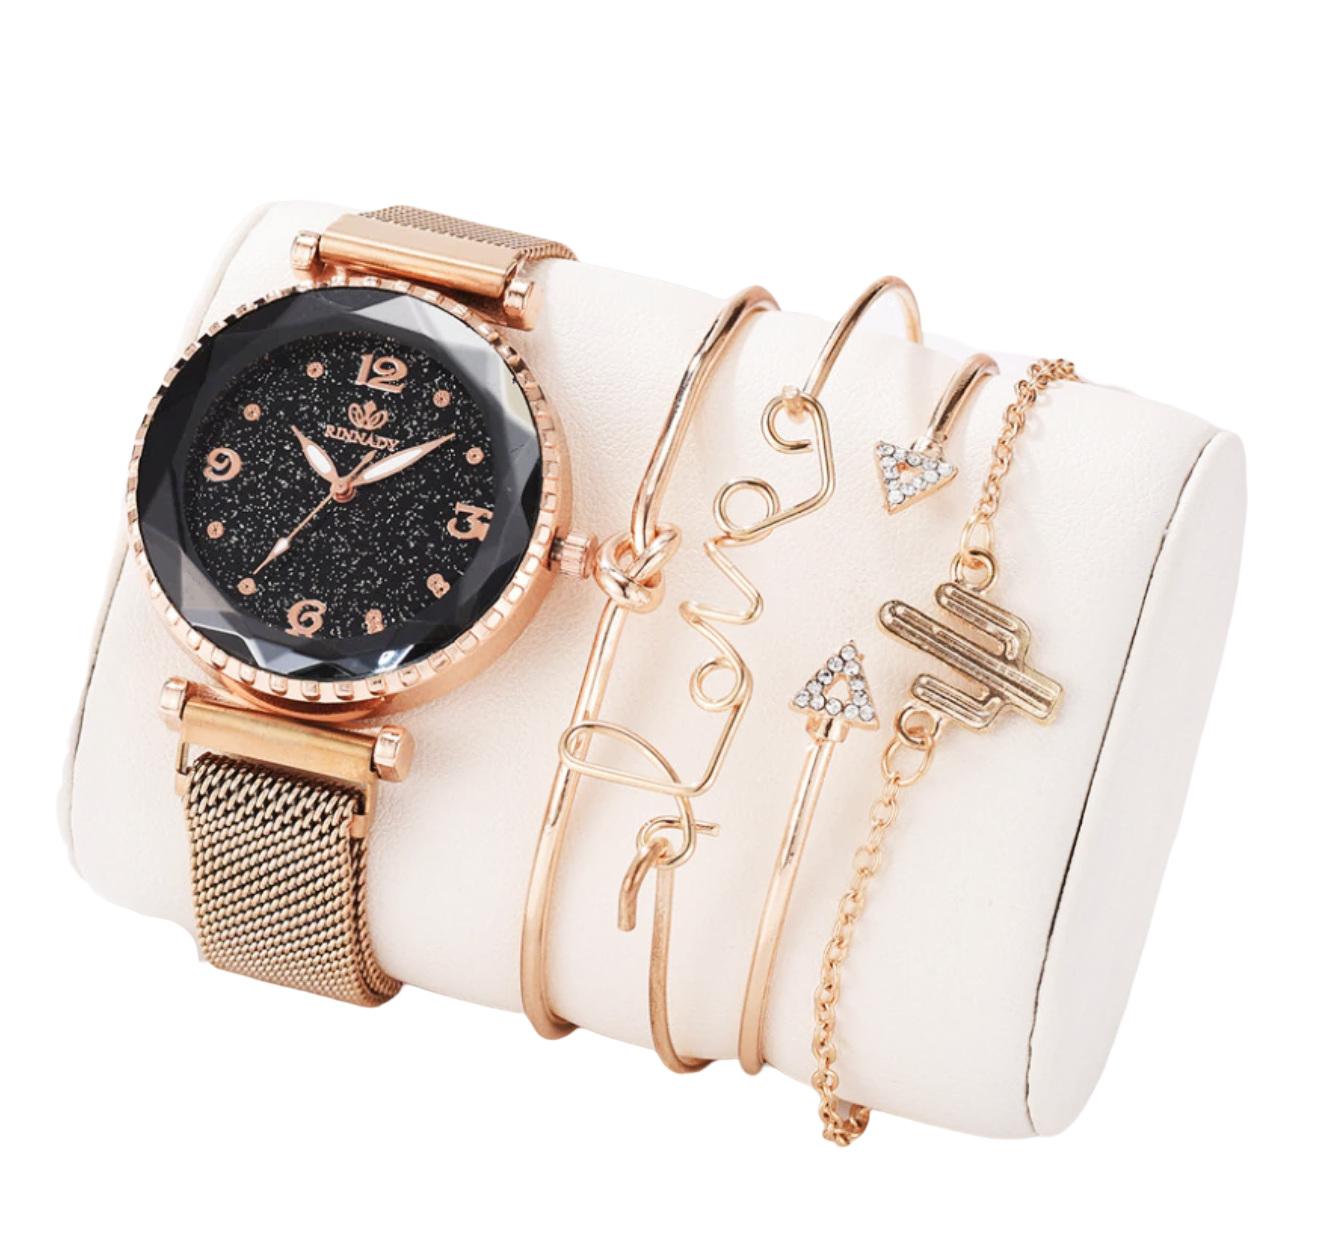 Kit com 1 Relógio Italia + 4 Pulseiras Fashion